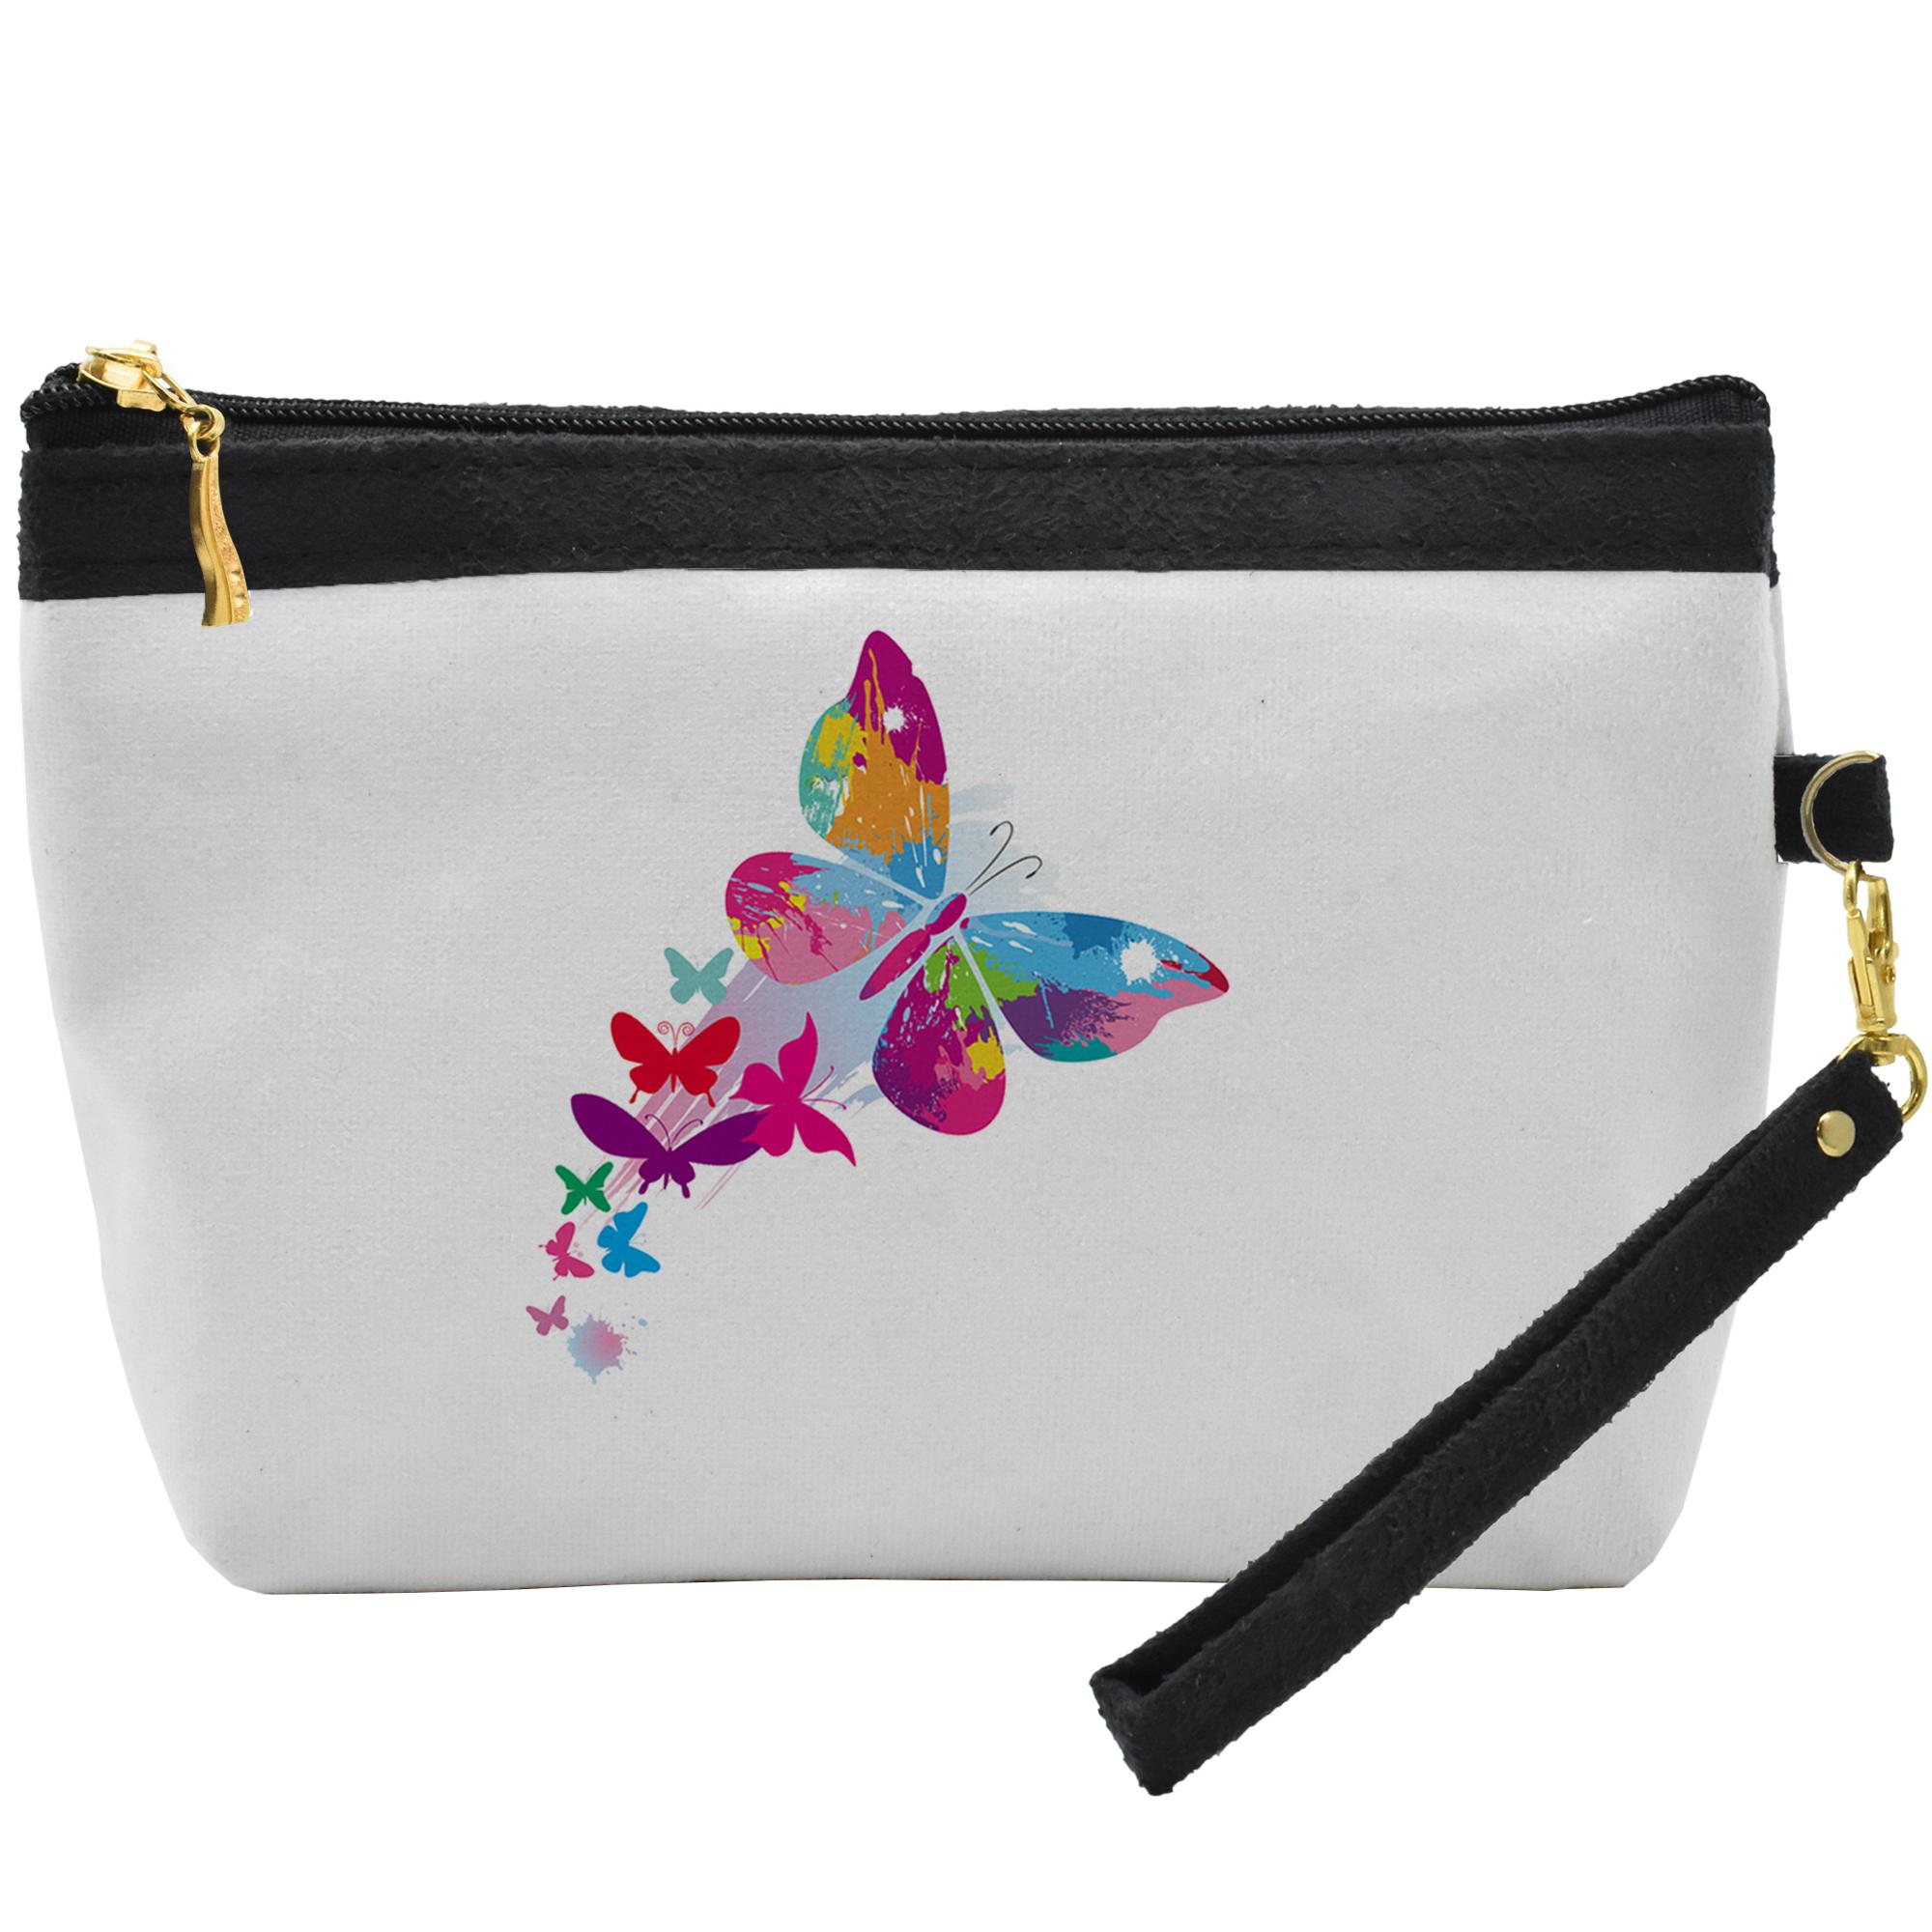 کیف لوازم آرایشی طرح پروانه کد C36